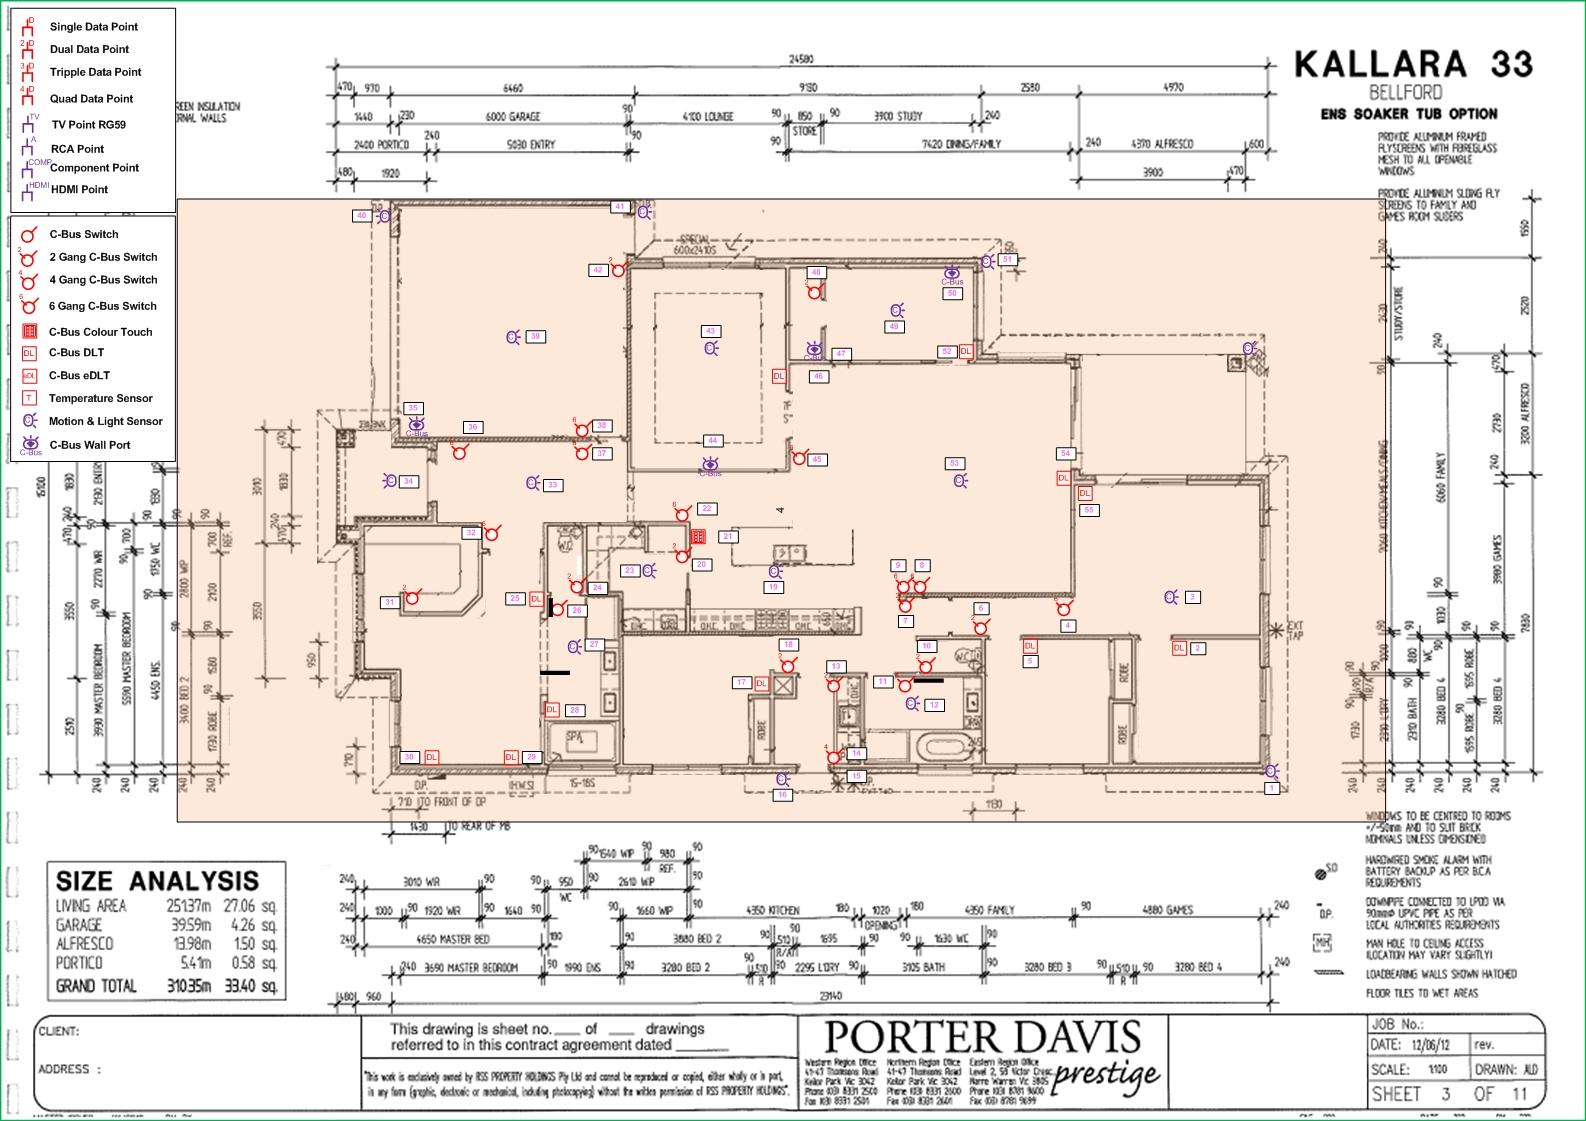 Exelent C Bus Wiring Diagram Elaboration - Electrical Diagram Ideas ...